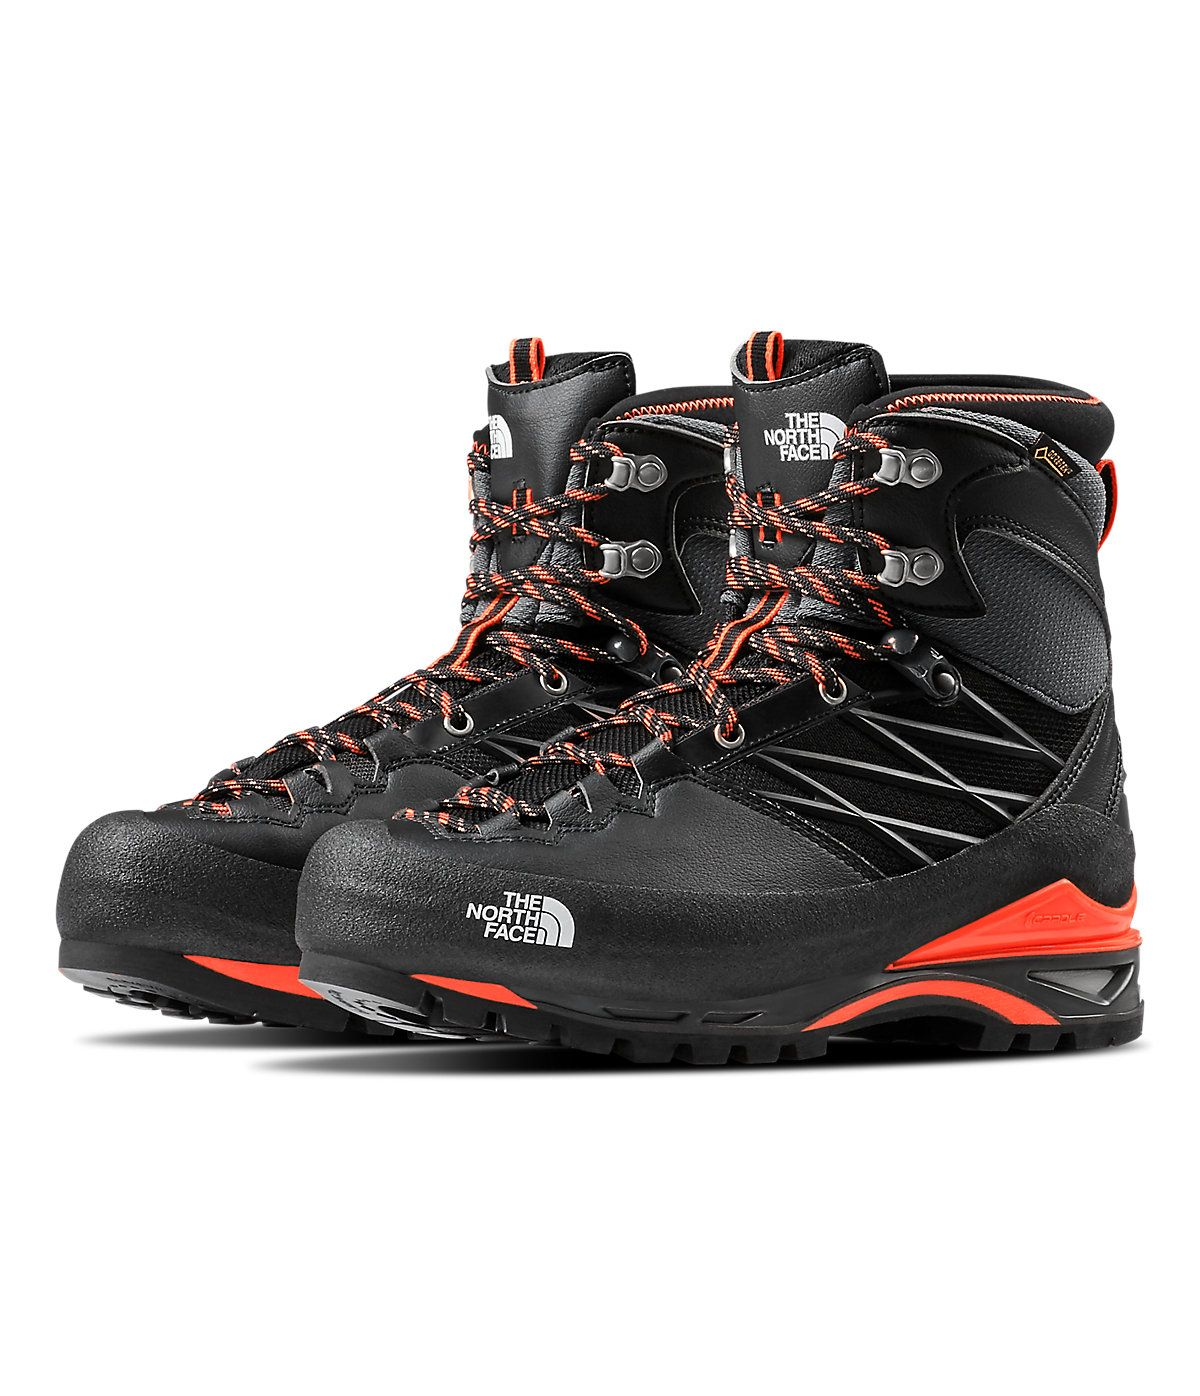 3d546e716 Women's verto s4k gore-tex® boots in 2019 | Products | Gore tex ...